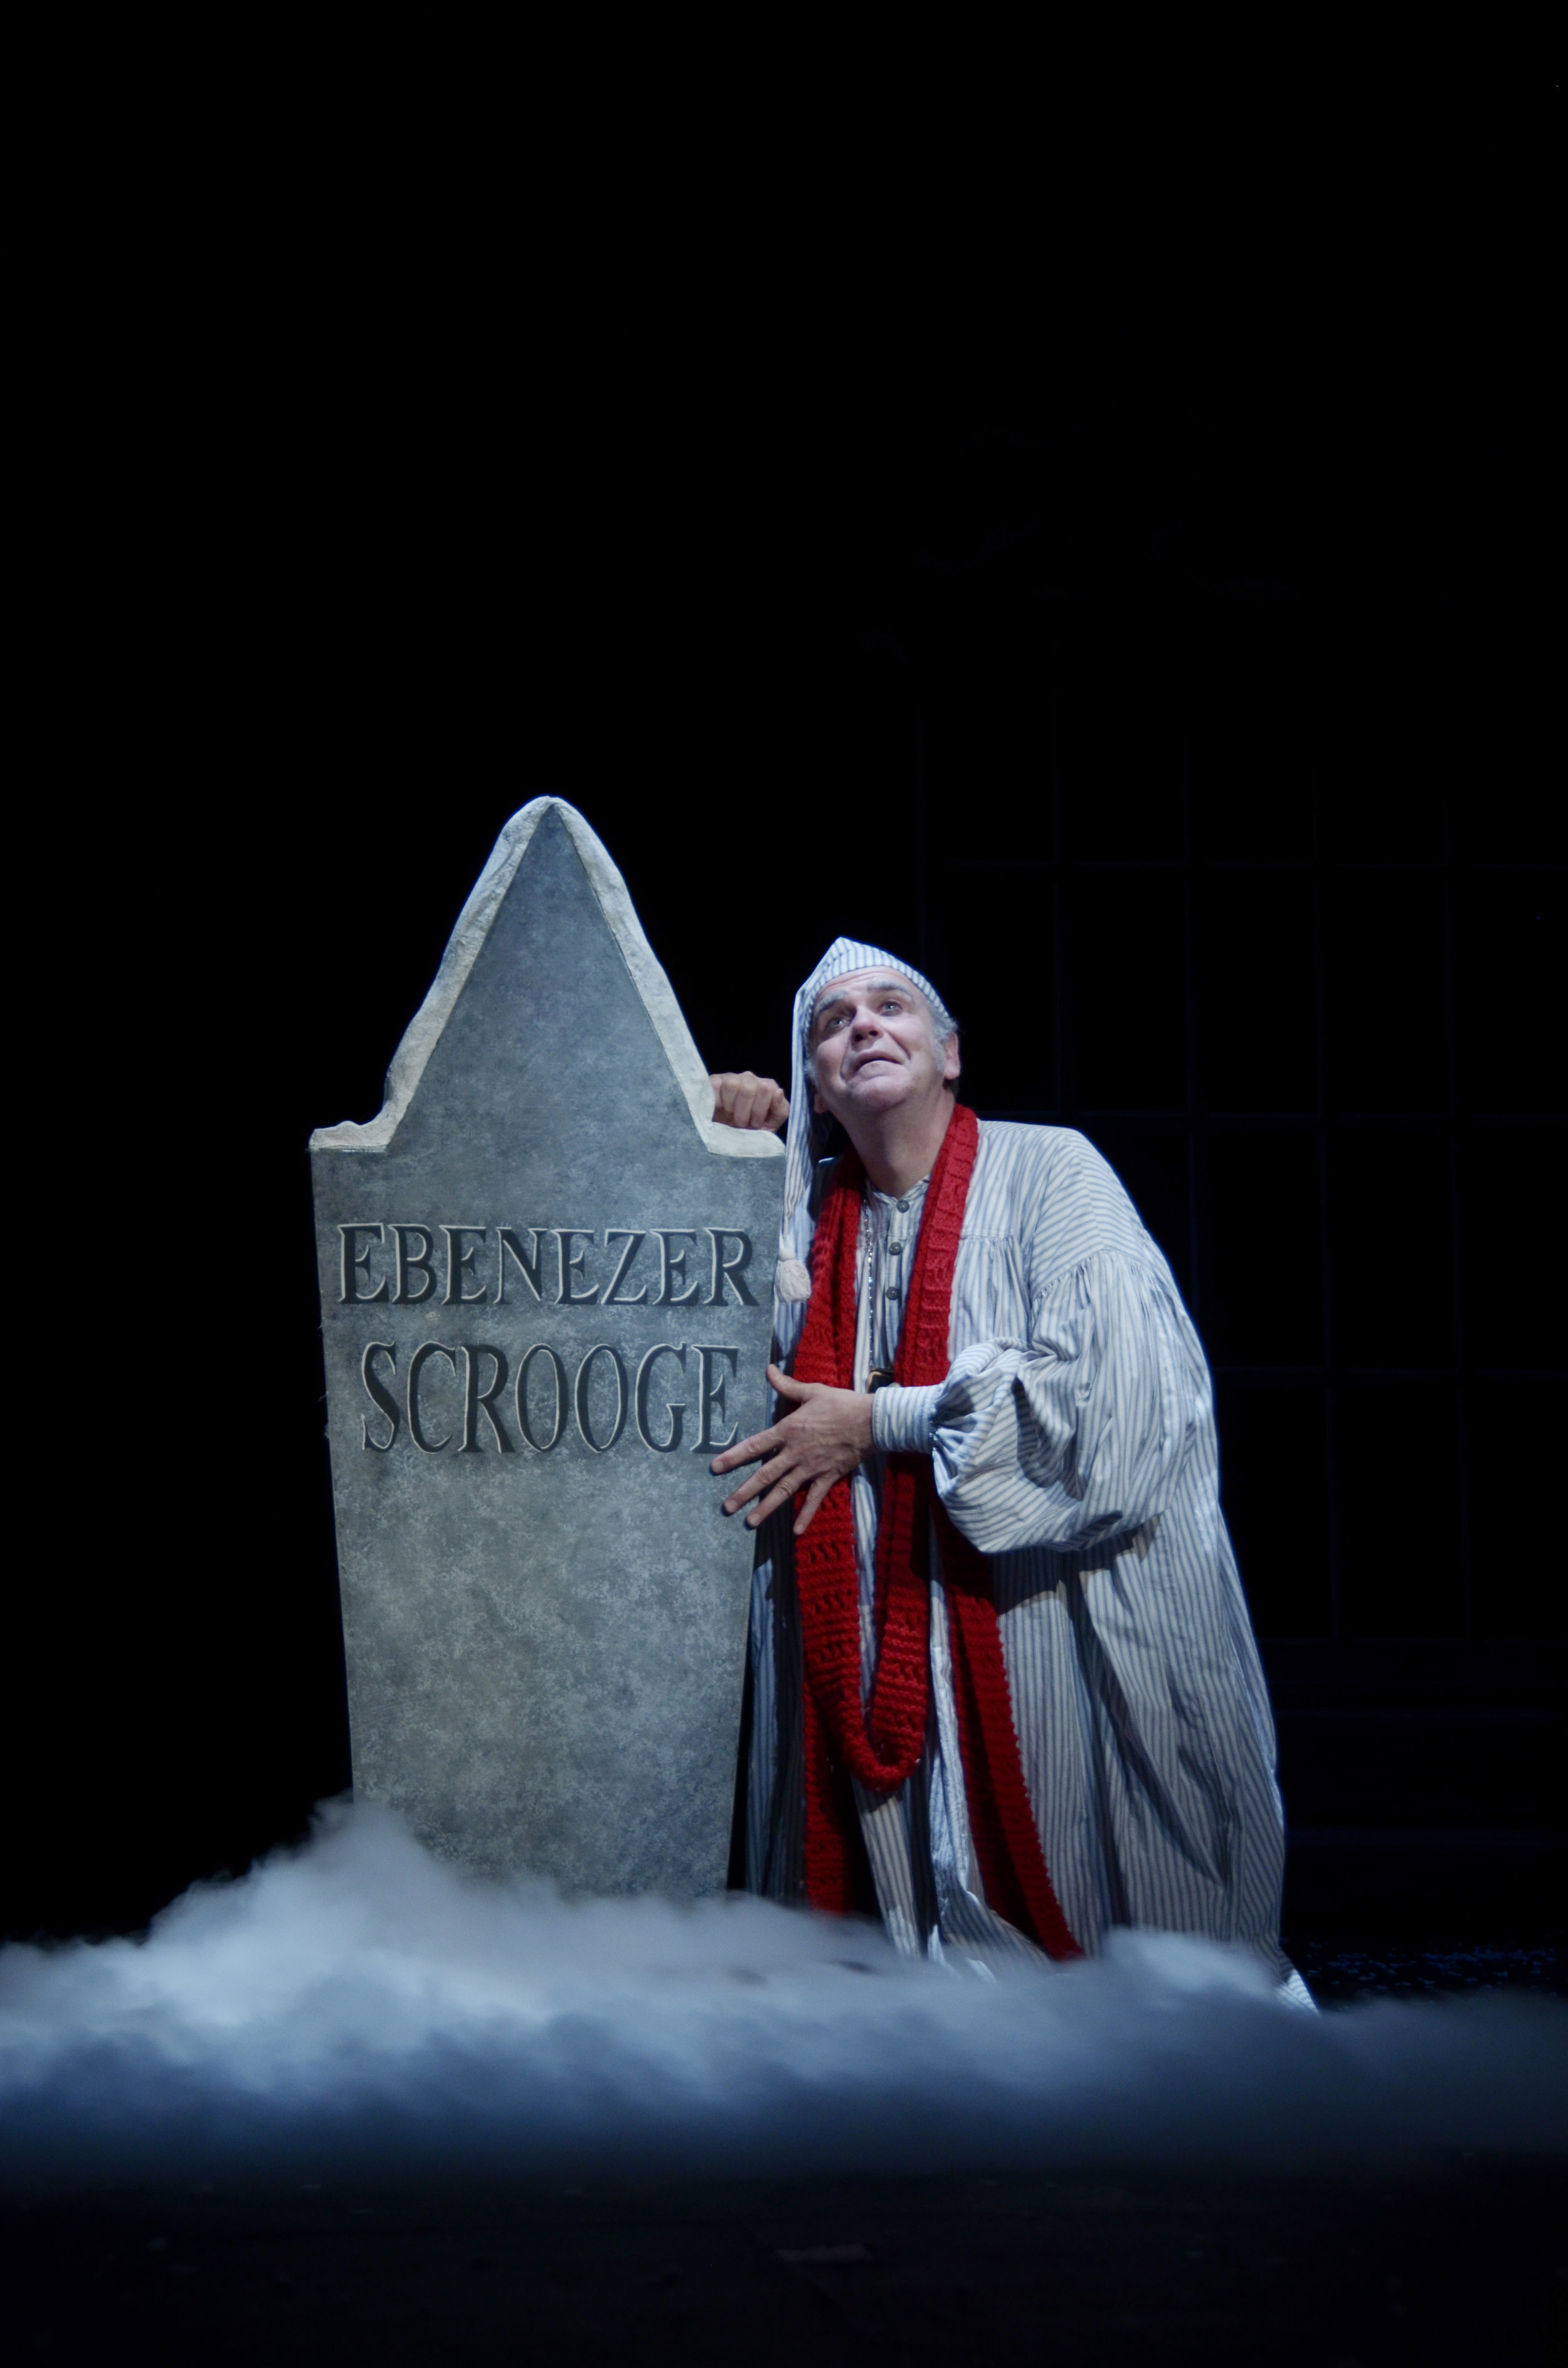 ScroogeTombstone2012.JPG